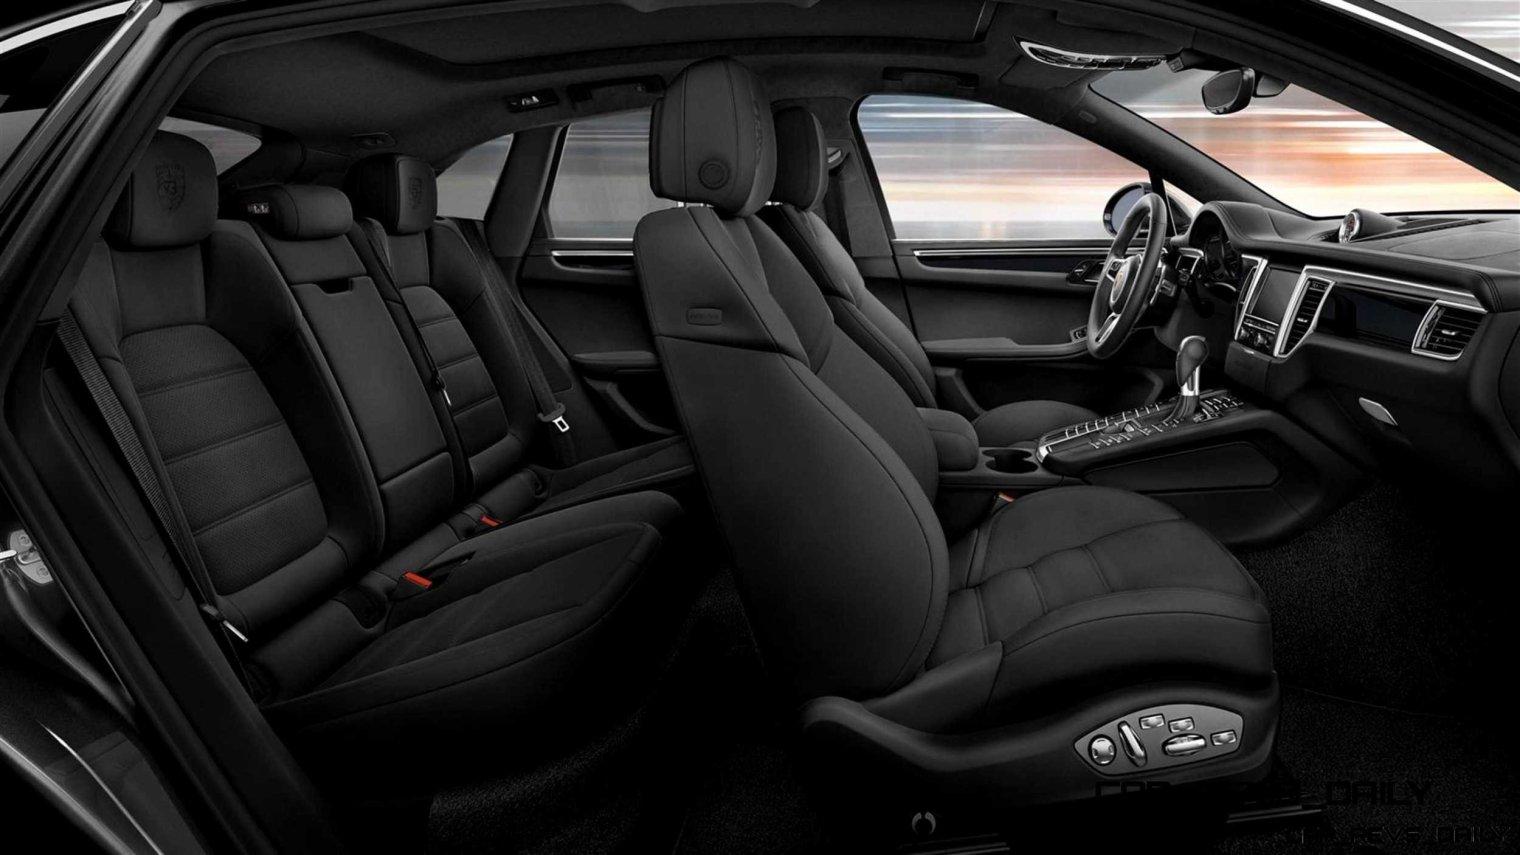 2015 Porsche Macan - Latest Images - CarRevsDaily.com 68